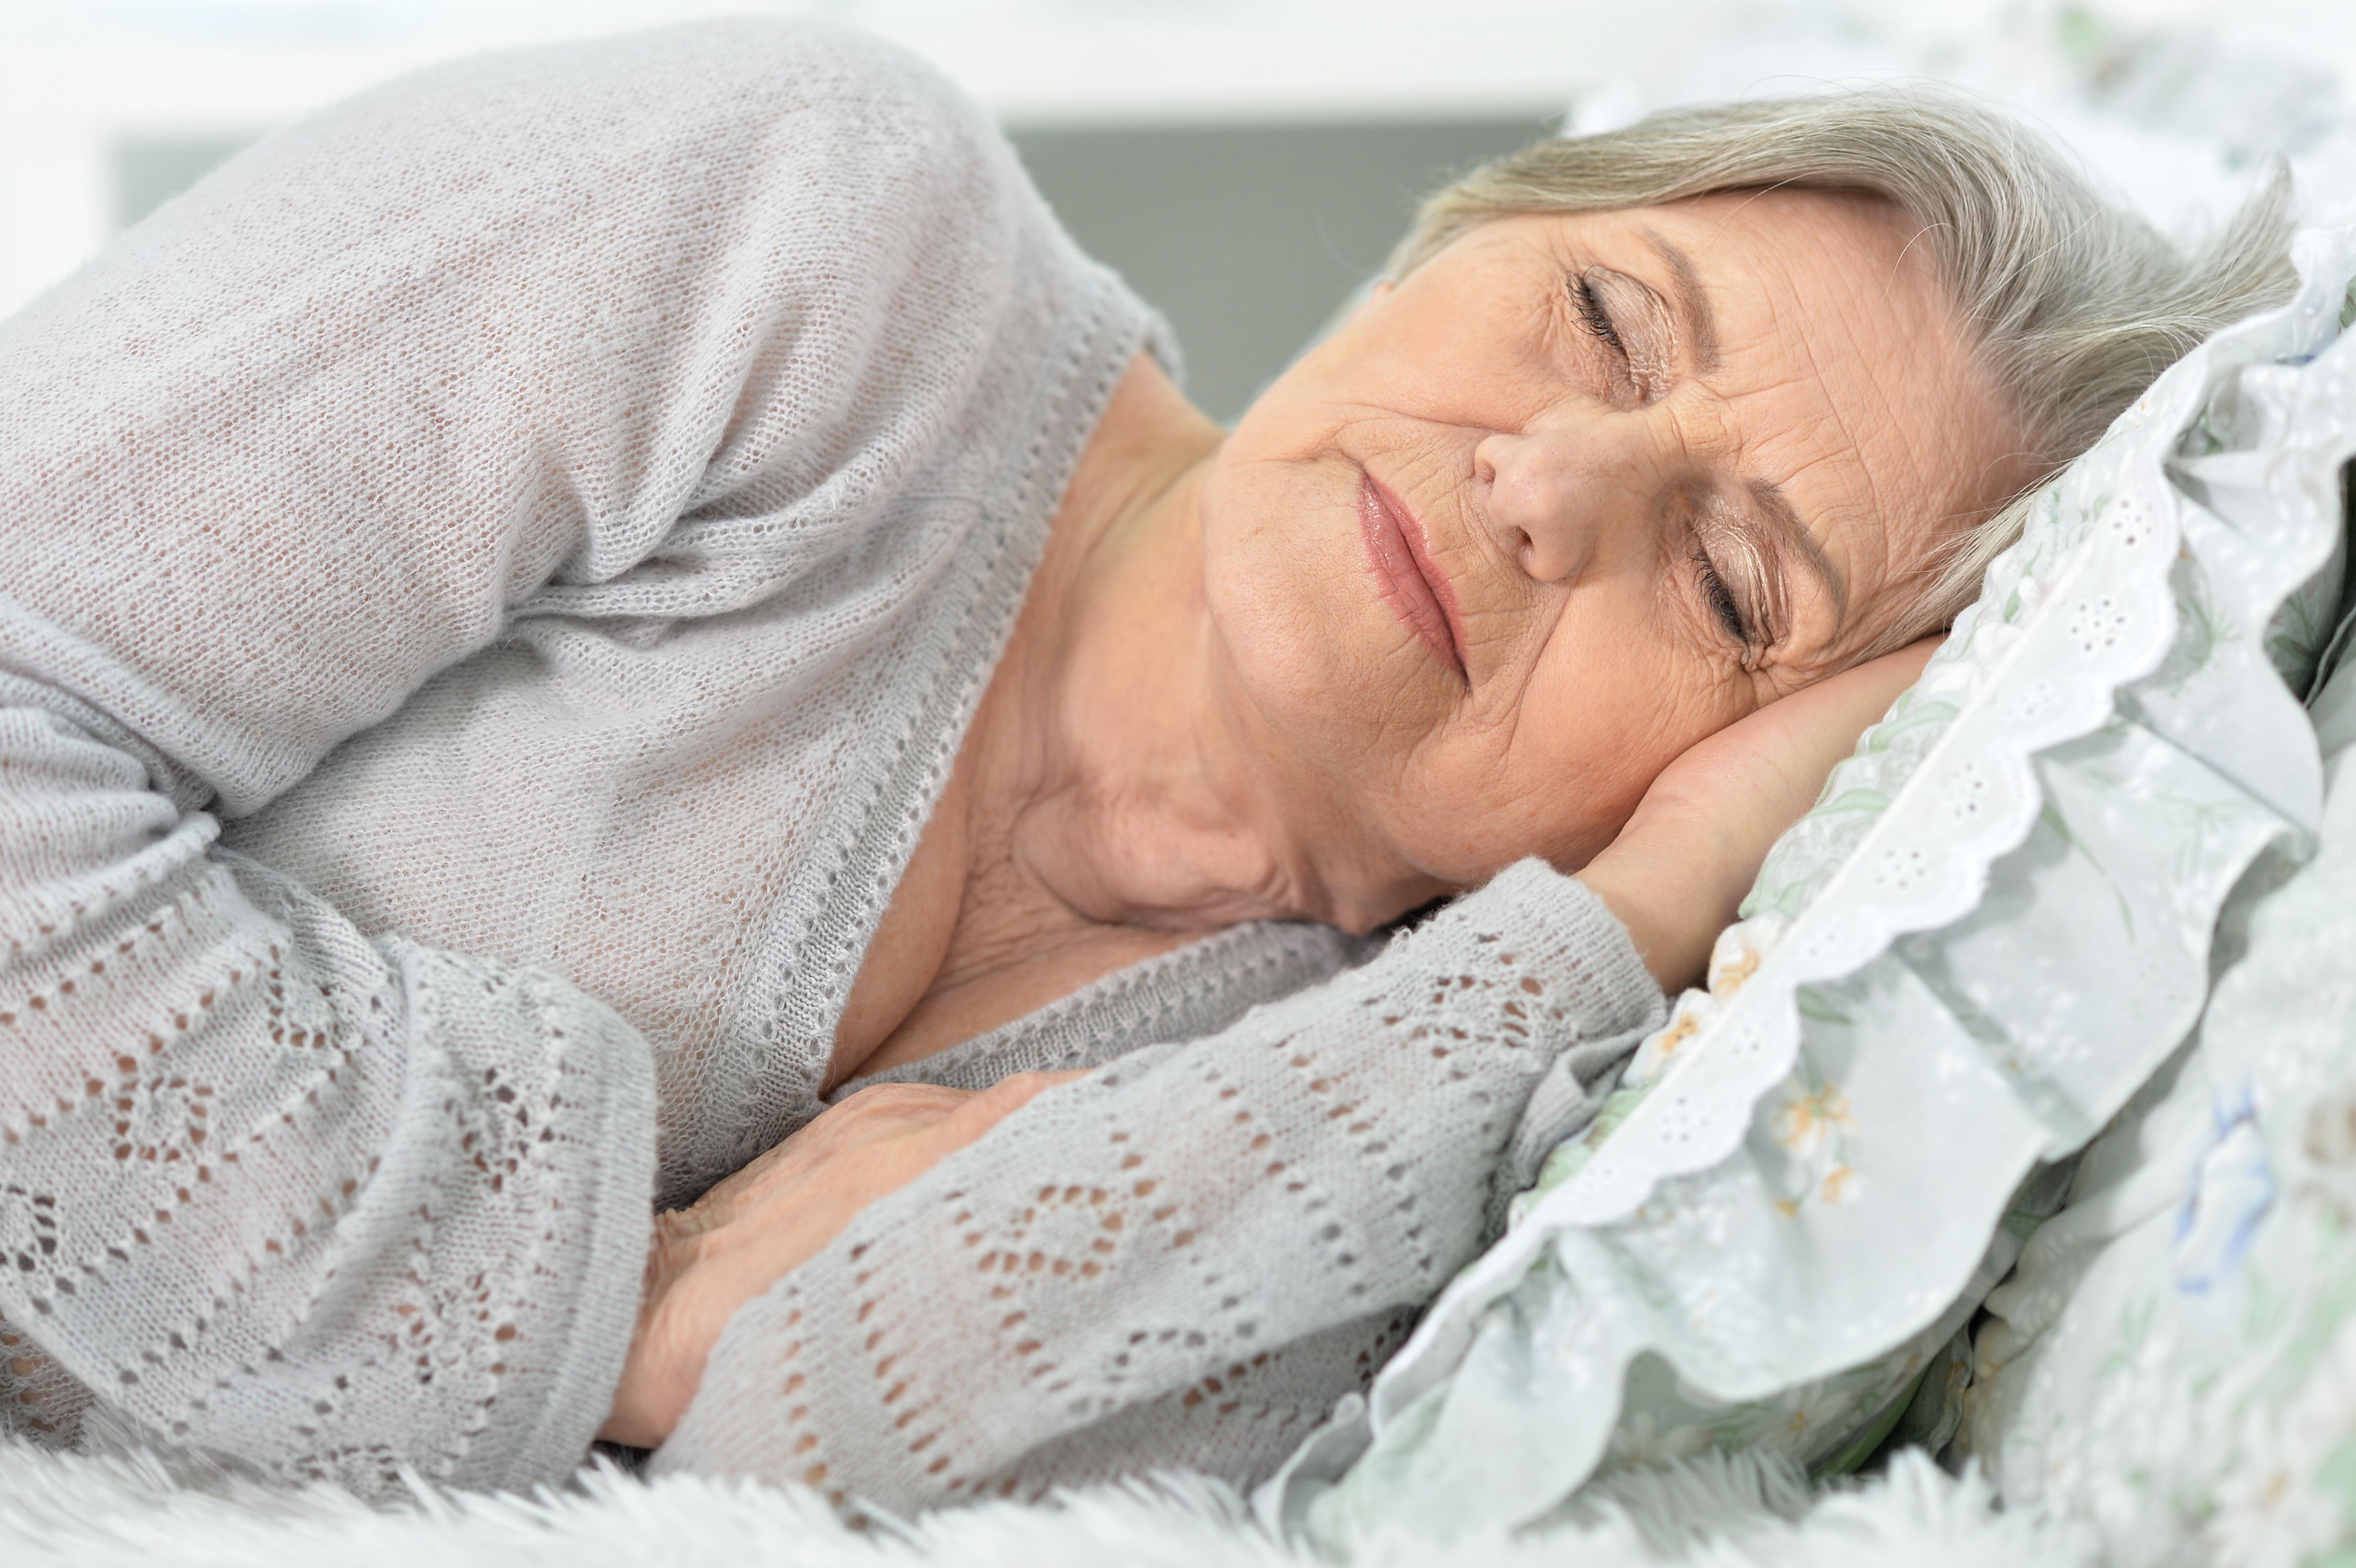 Restorative Sleep with COPD and Sleep Apnea